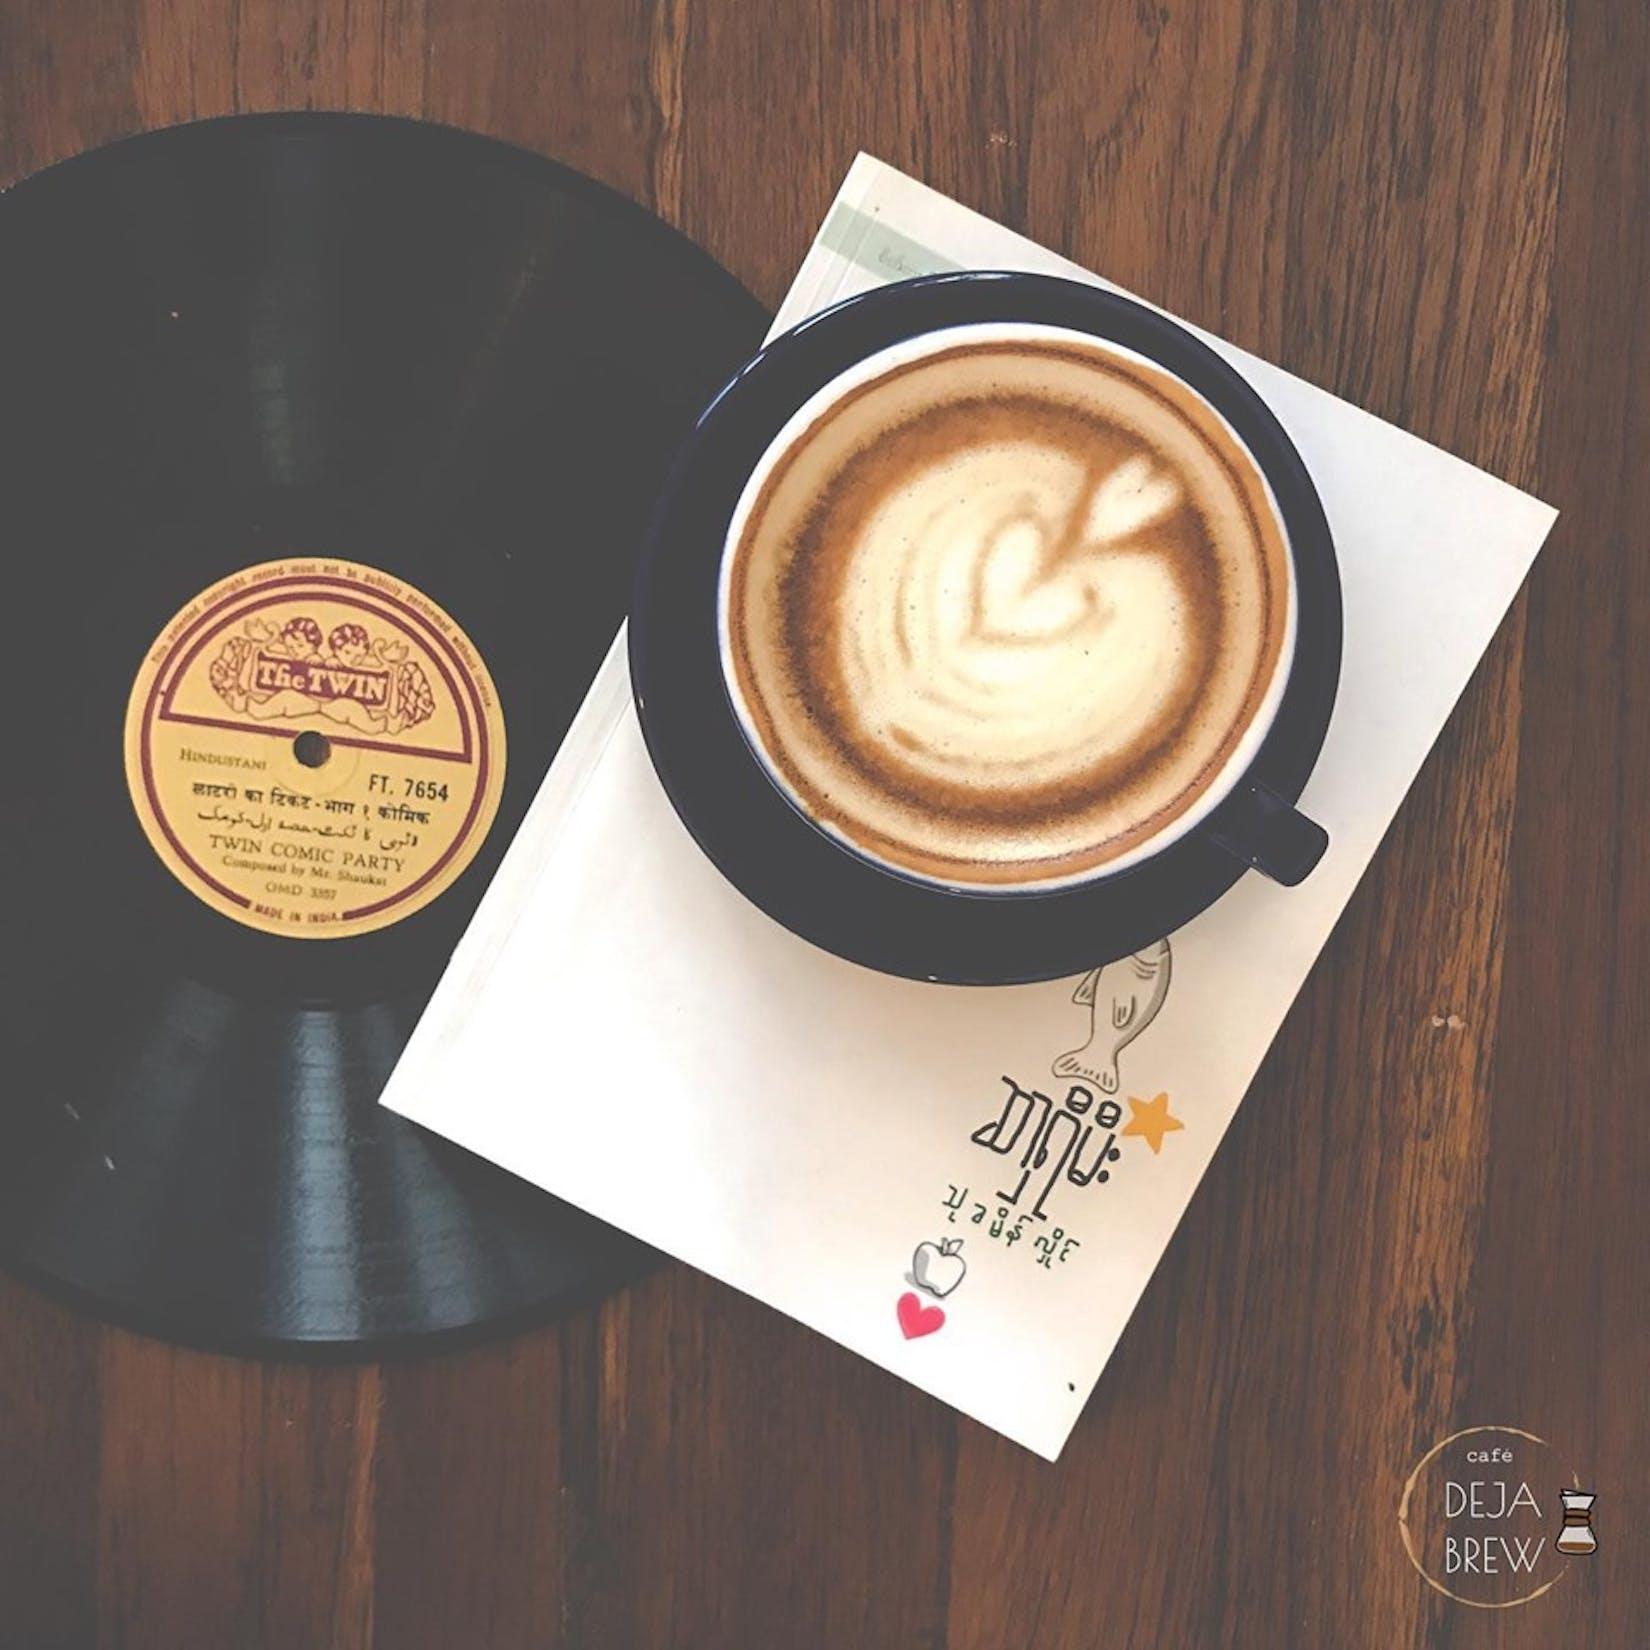 Cafe Deja Brew | yathar